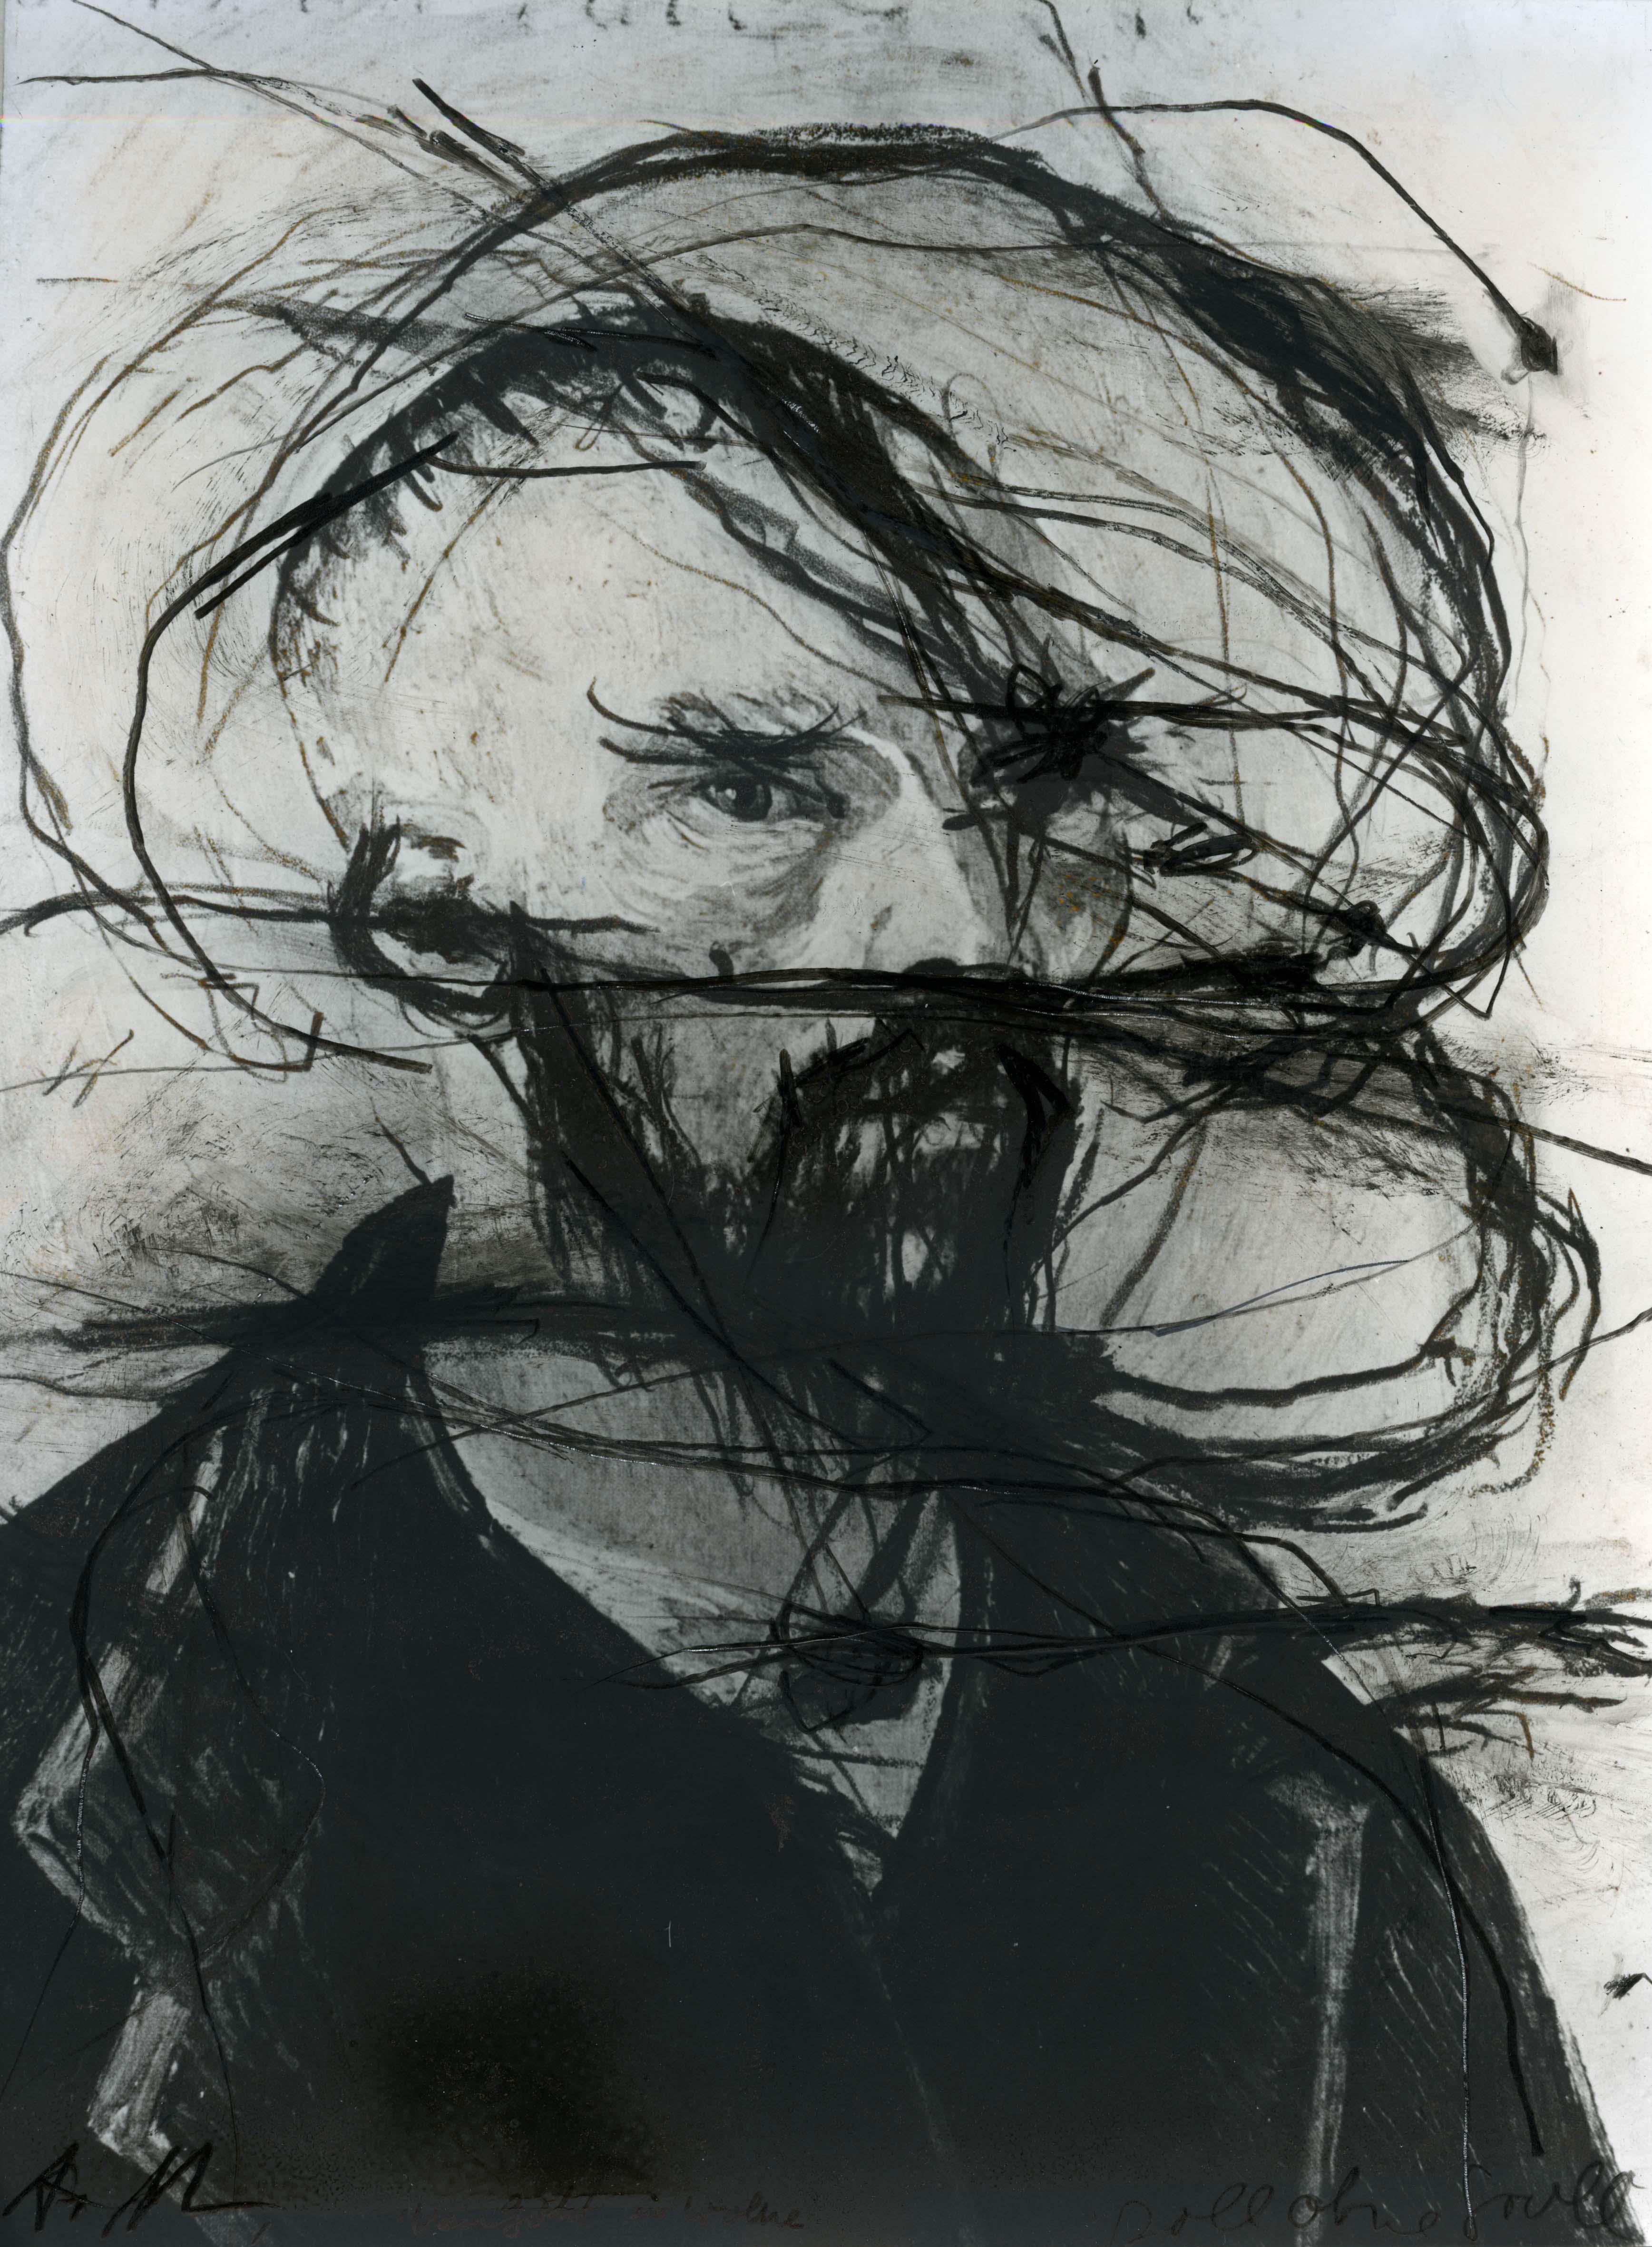 CollectieKunstfondsVincentvanGoghHuis_ArnulfRainer_Van Gogh in Wolke_1977_ Ubermalung_Geschenk F. Becht